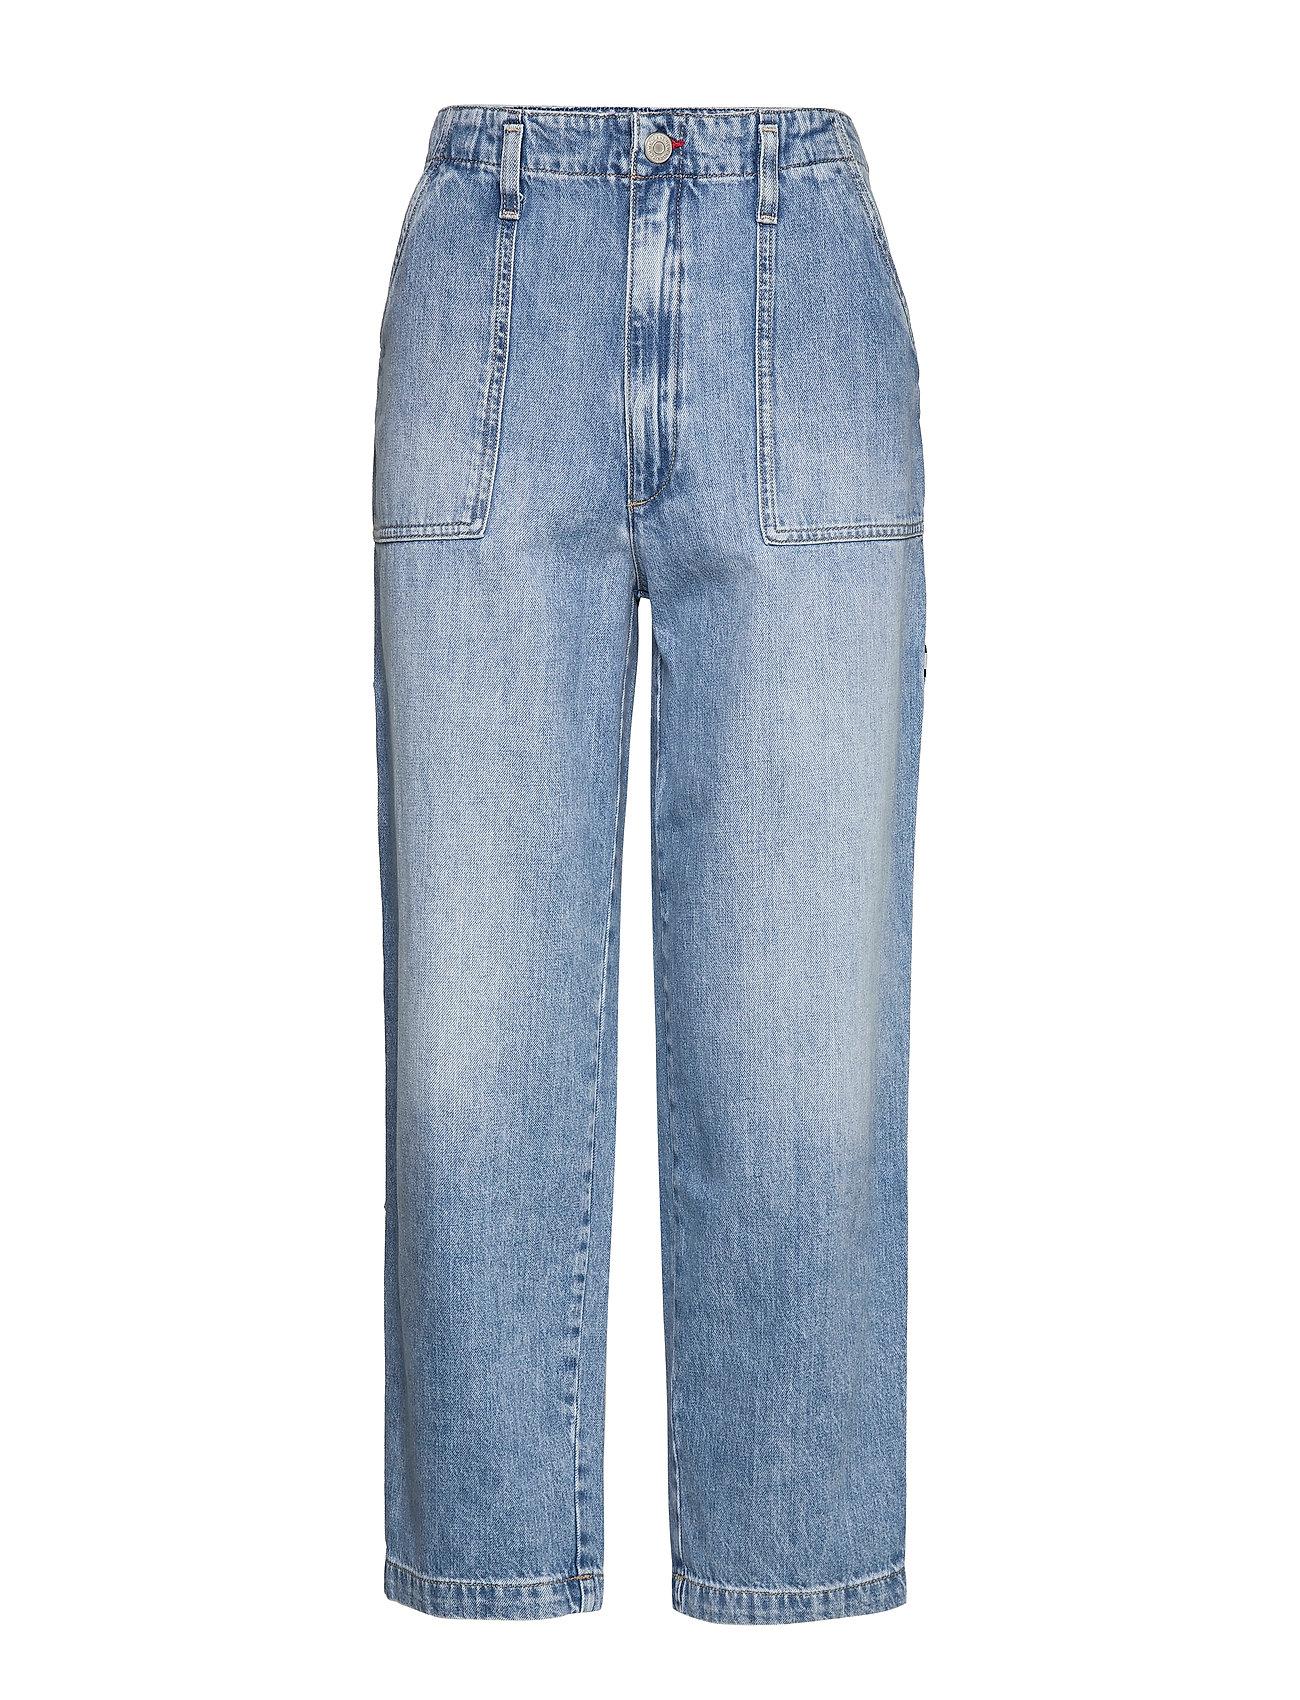 Tommy Jeans CARGO PANT  NTSLR - 90S LIGHT BL RIG